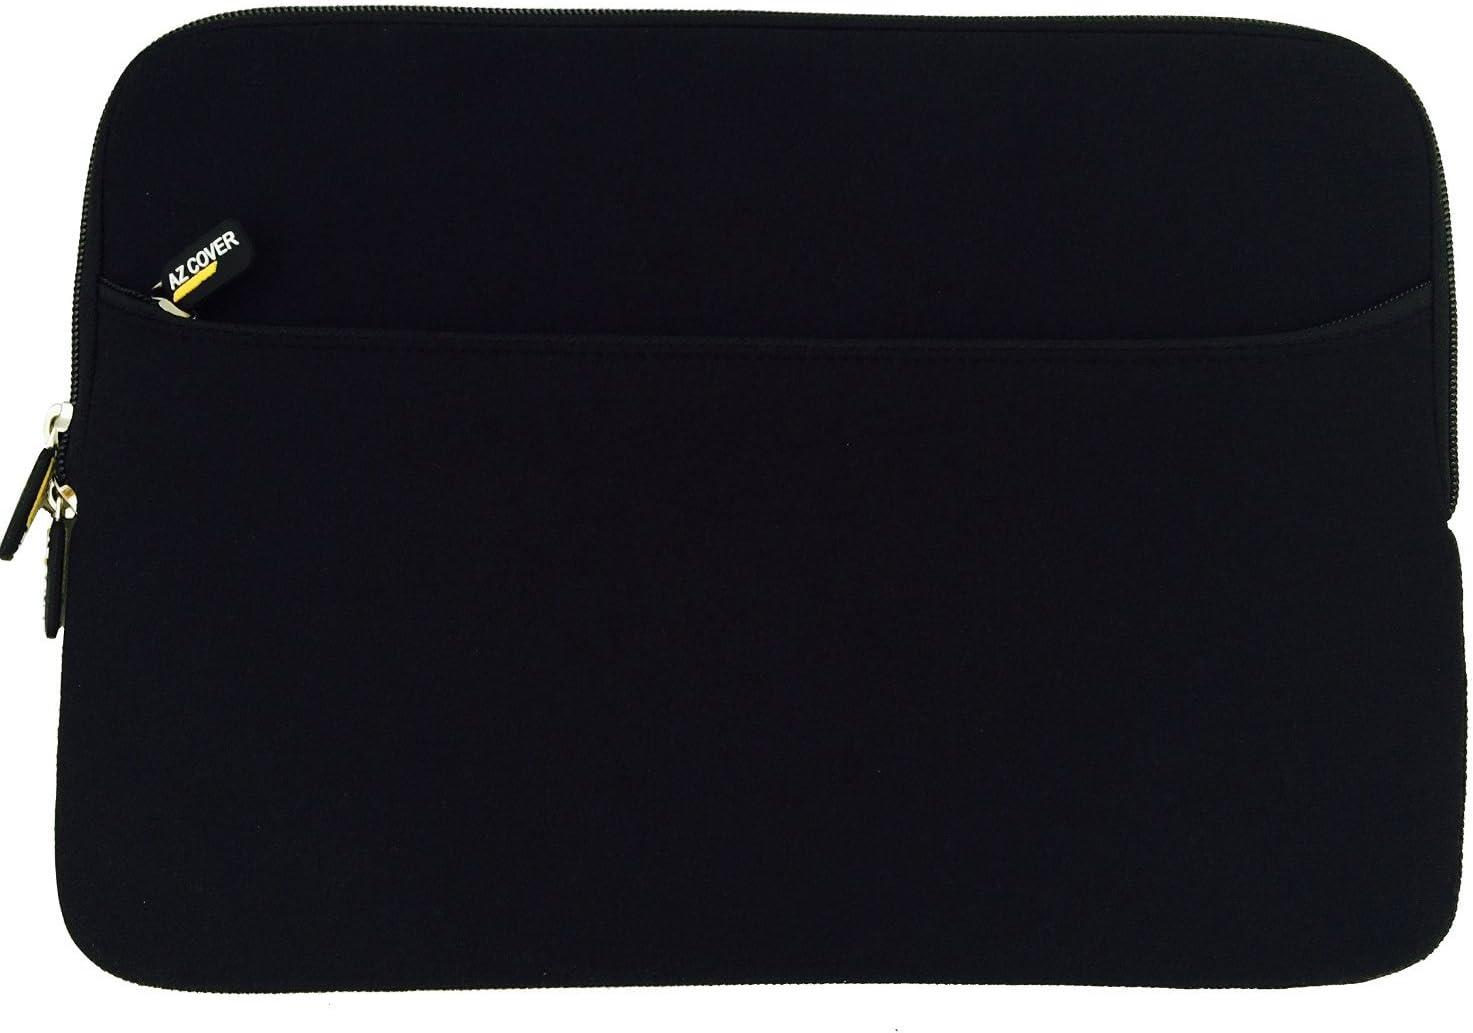 AZ-Cover 10.1-Inch Tablet Laptop Sleeve Bag (Black) For ASUS Transformer Book T100-CHI-C1-BK M - 10.1